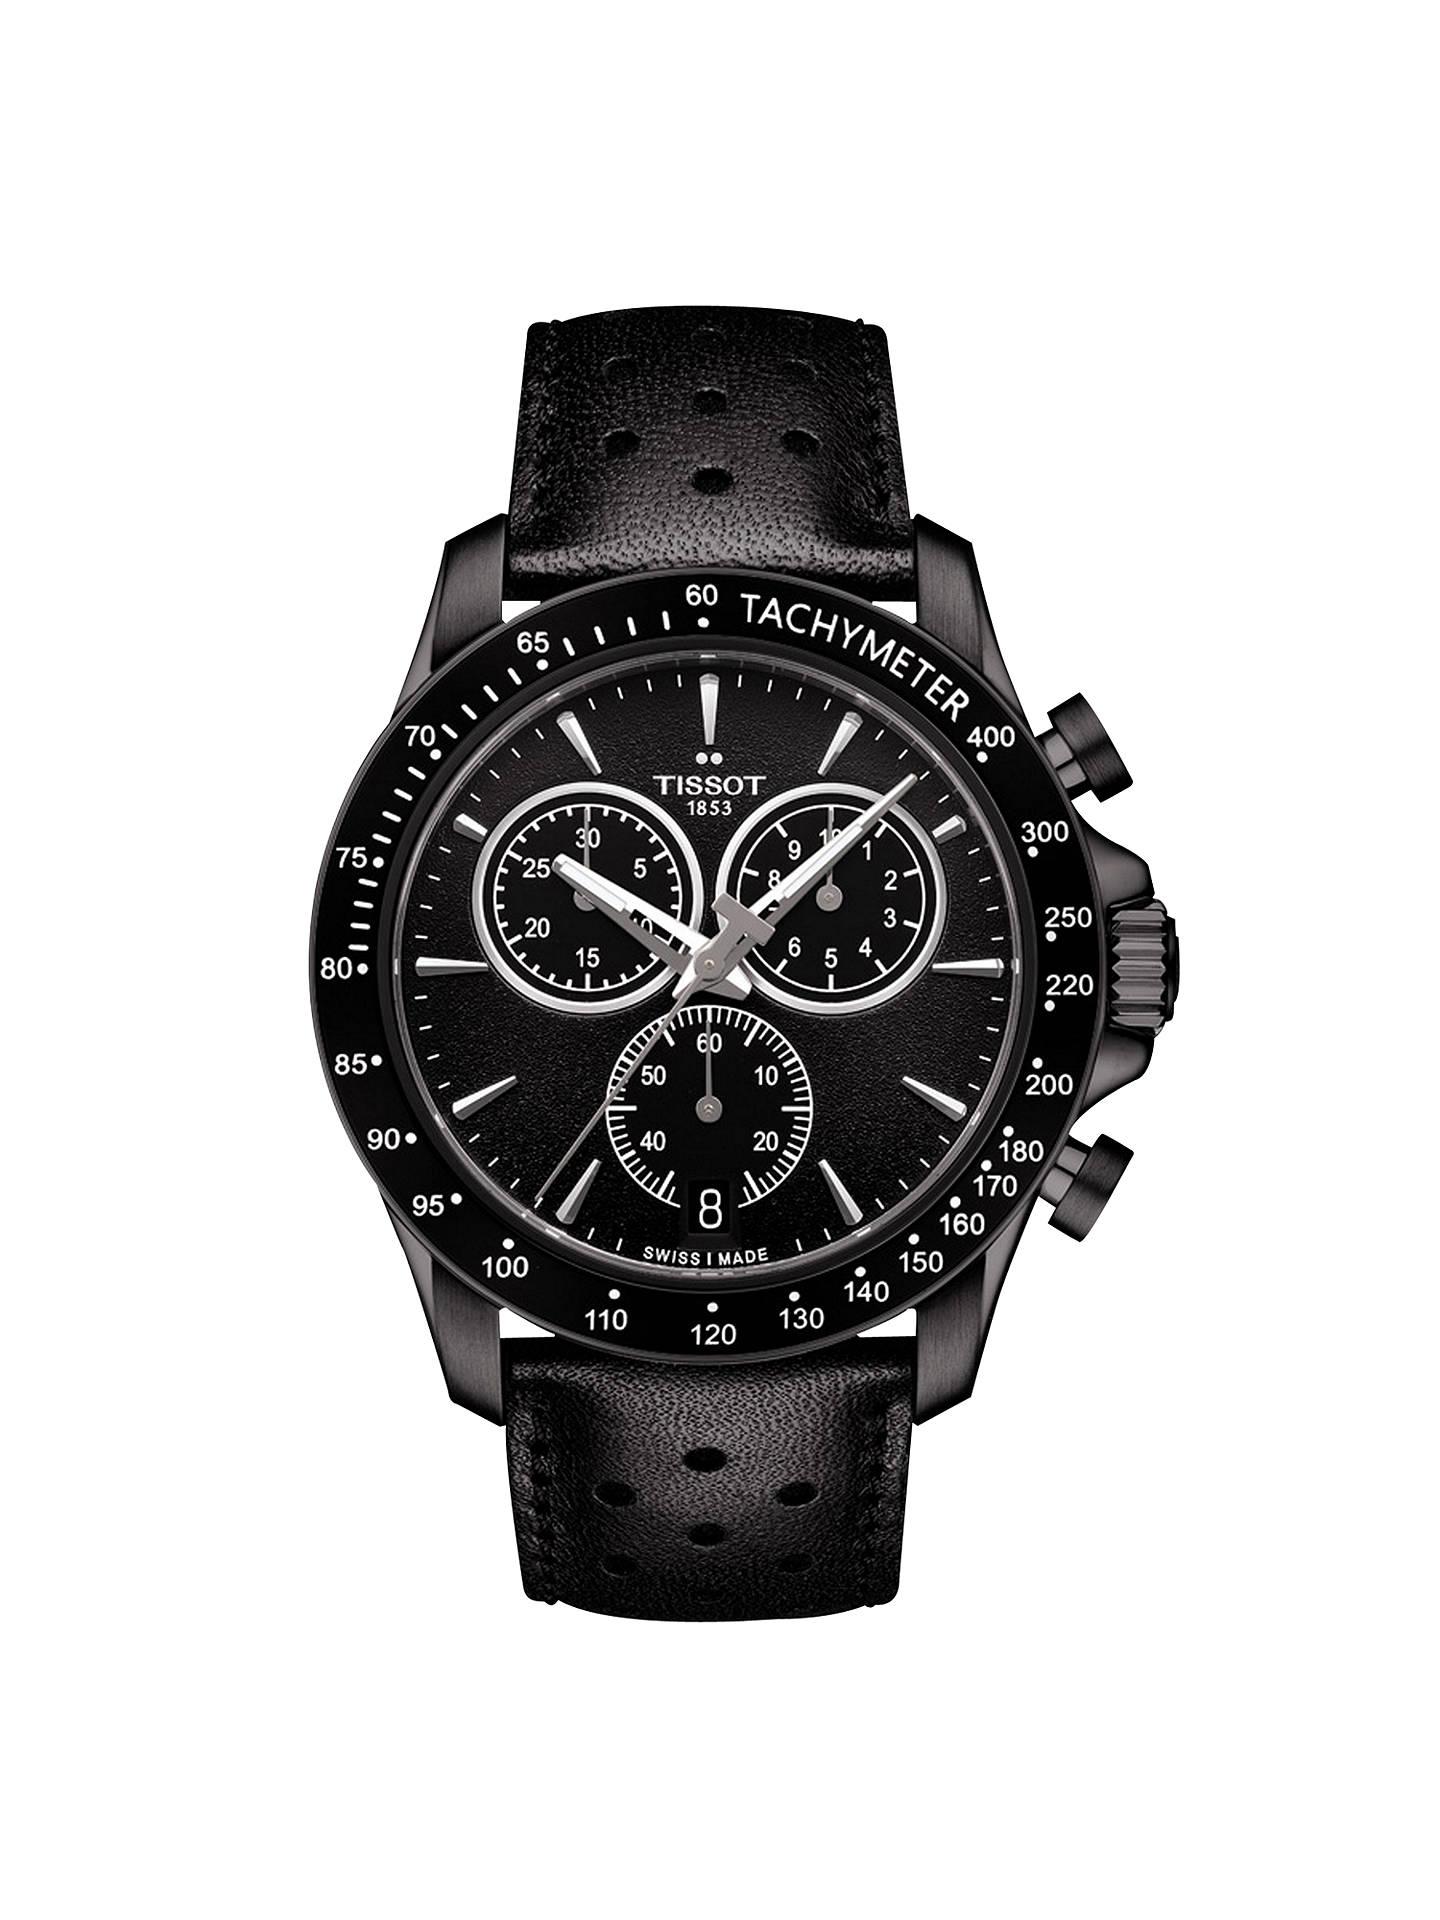 Tissot T1064173605100 Men's V8 Chronograph Date Leather Strap Watch, Black